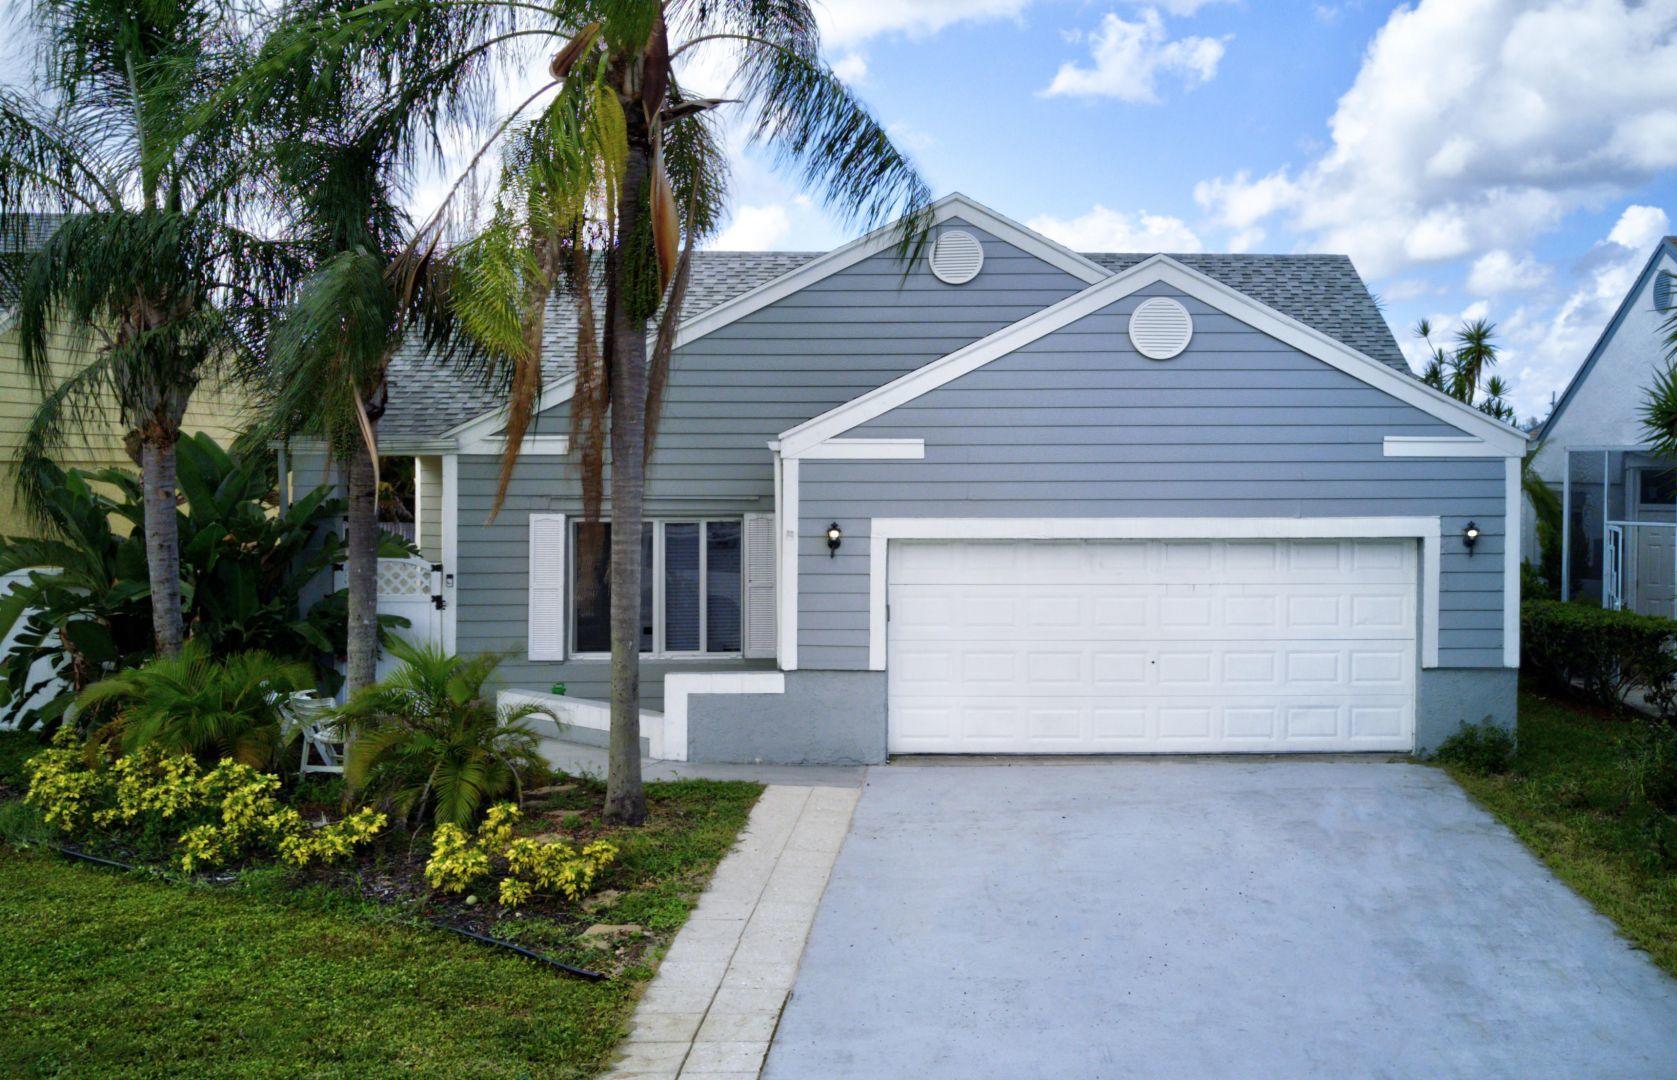 8519 Dynasty Drive Boca Raton, FL 33433